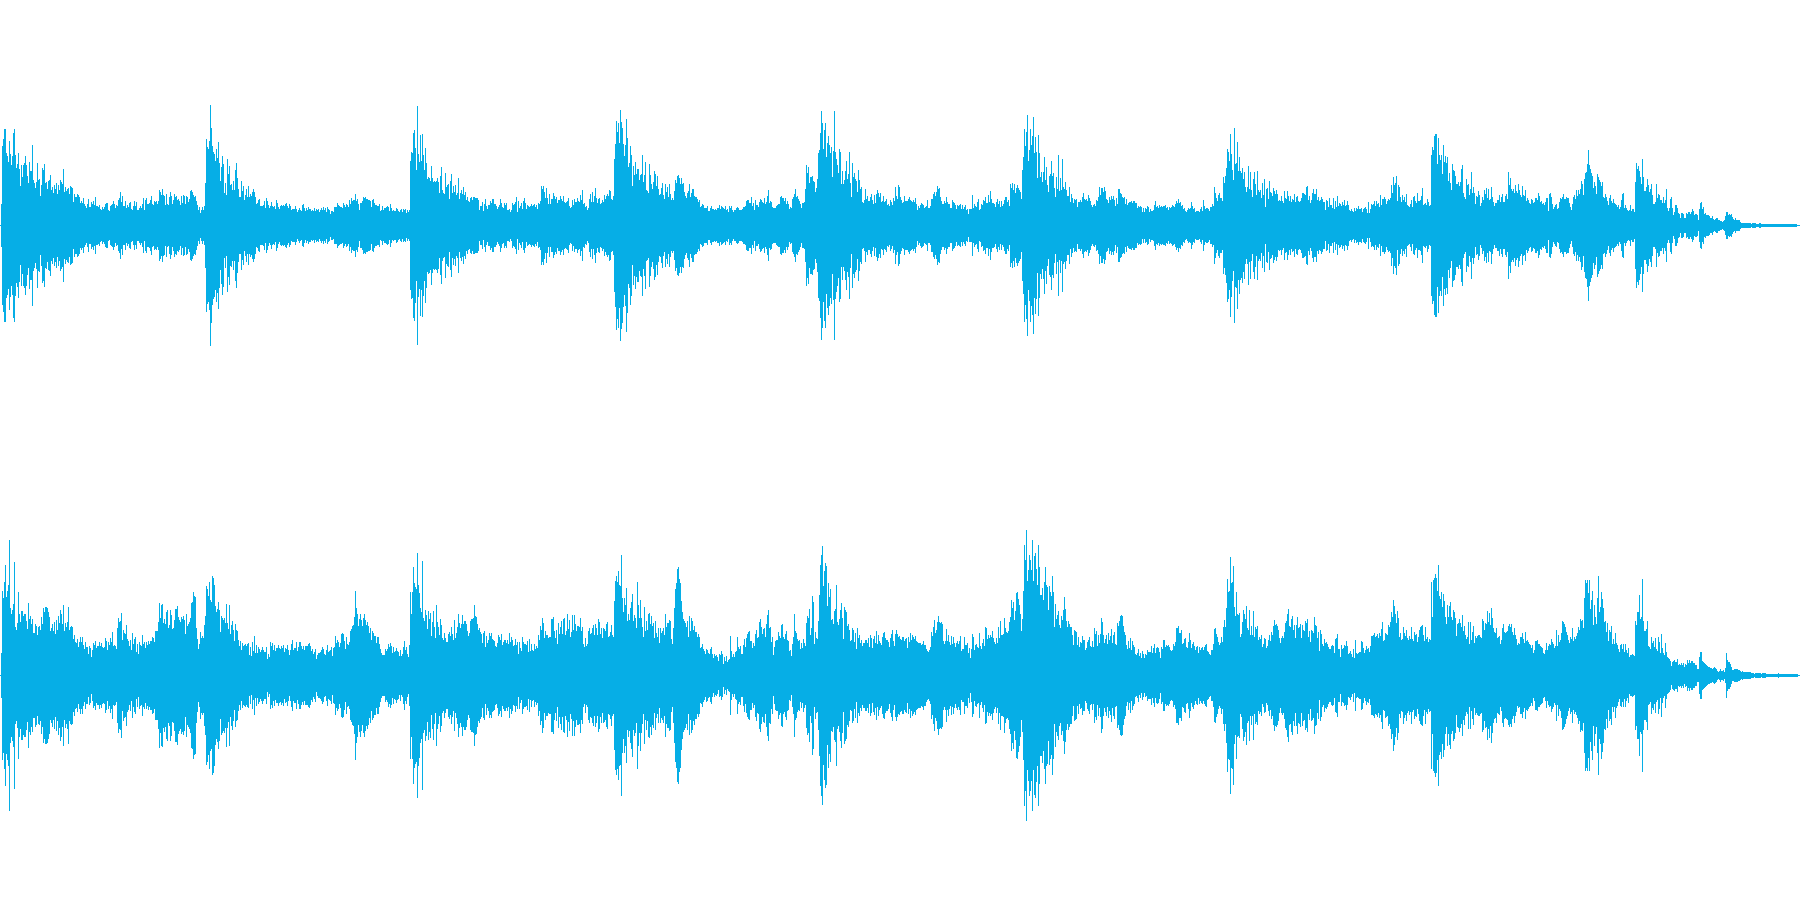 Soundtrack 1の再生済みの波形